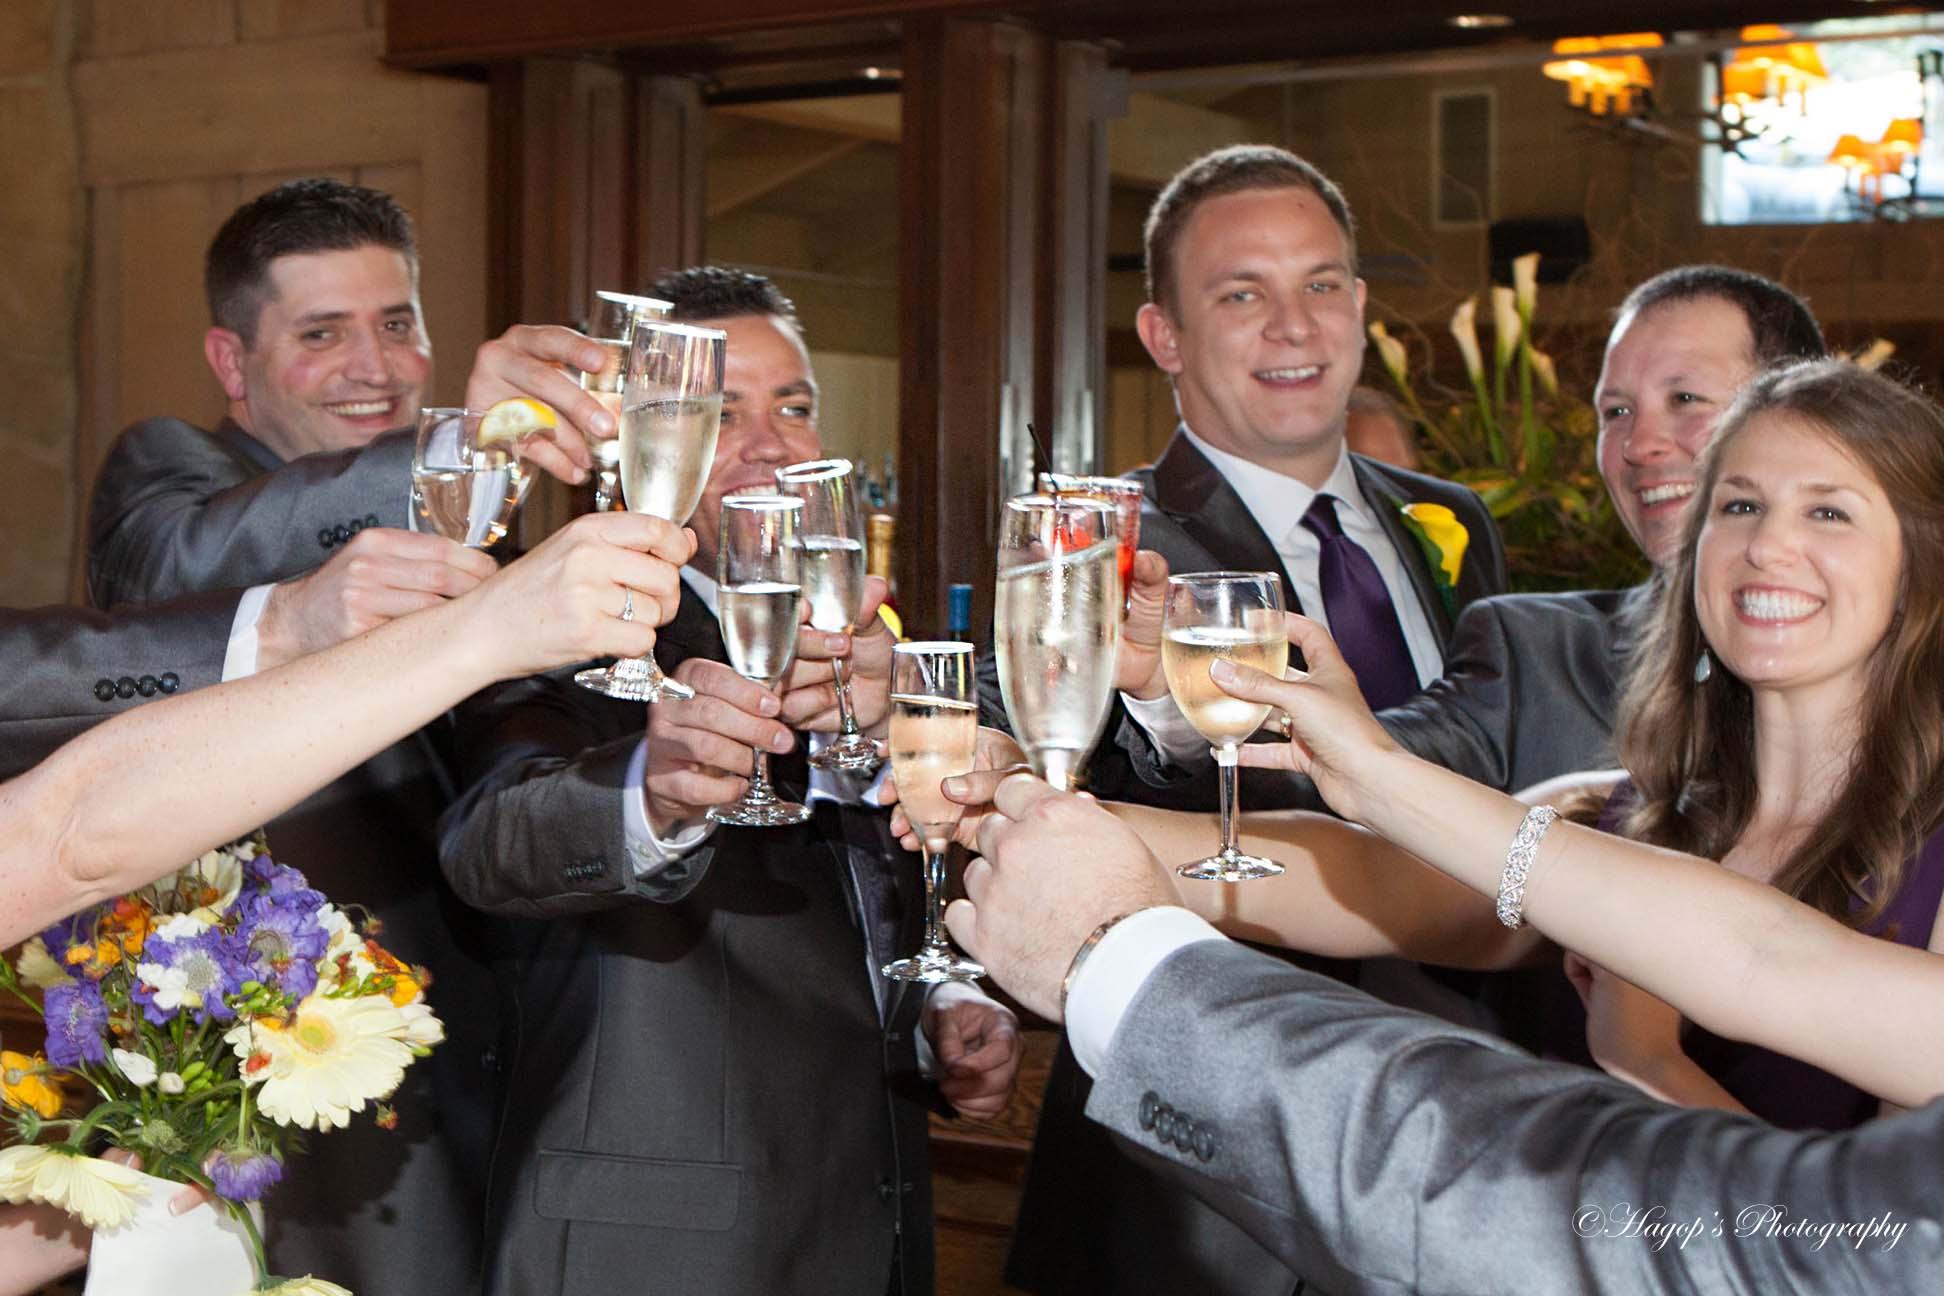 groomsmen and a bridesmaid toasting